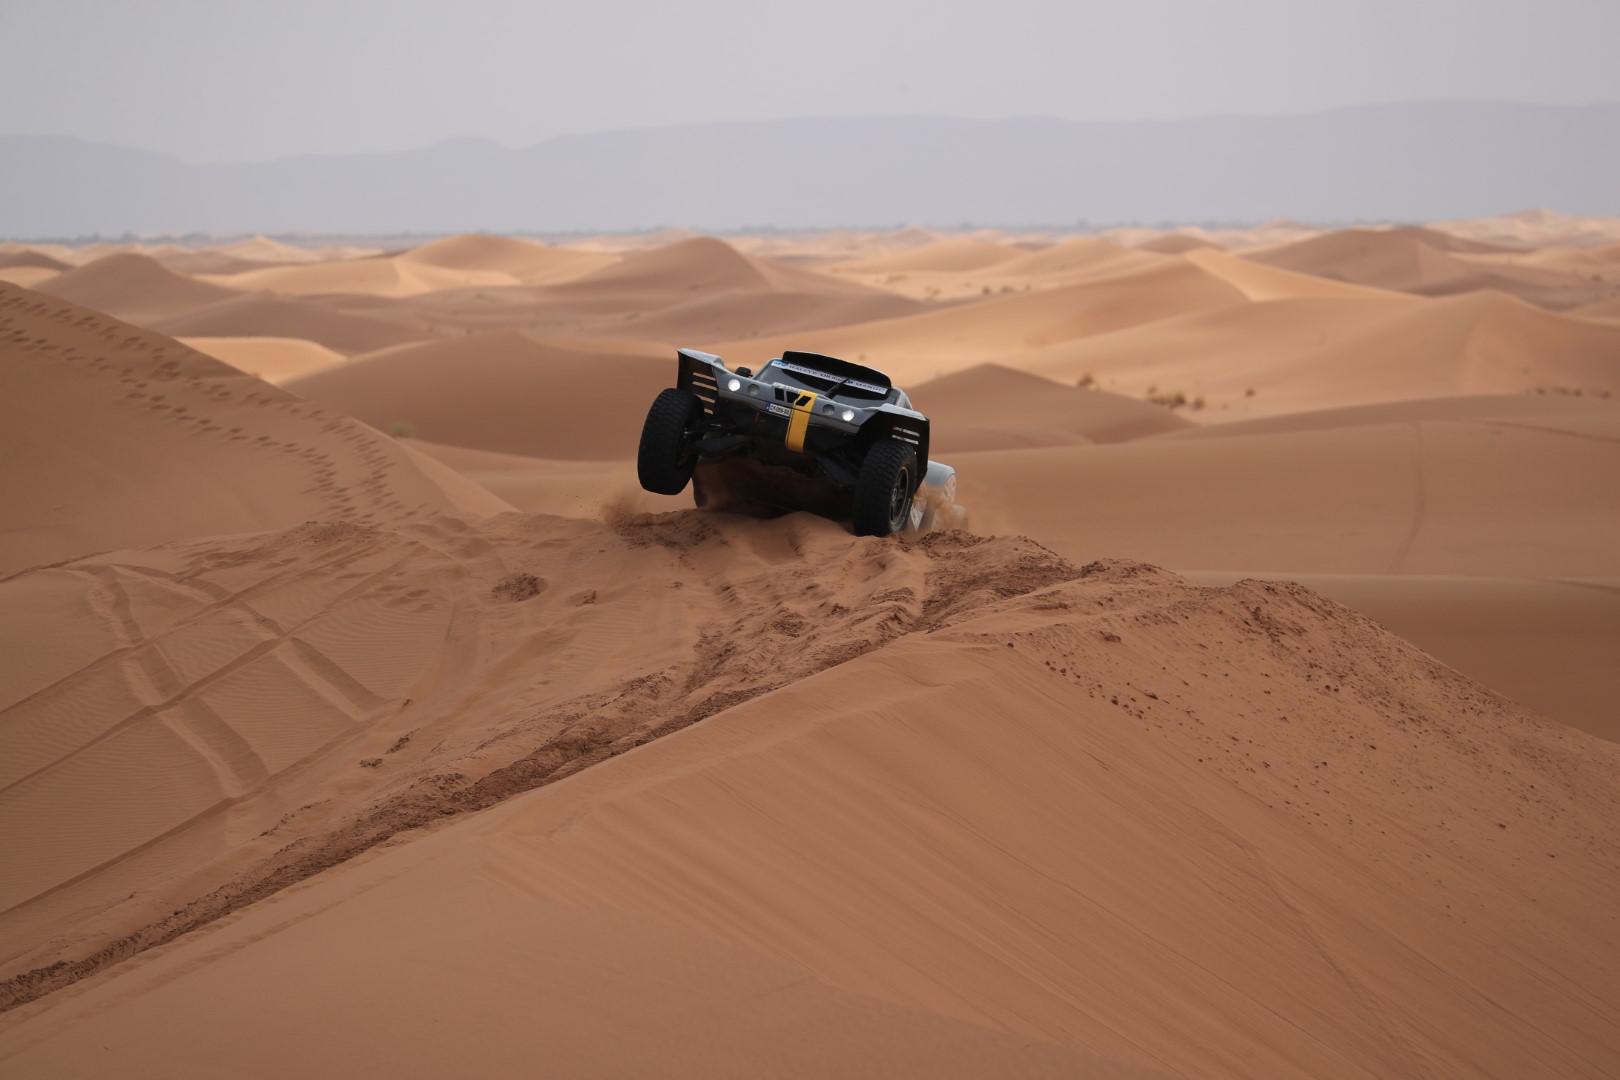 l-equipe-objectif-dunes-de-l-aeronautique-au-desert-878-4.jpg